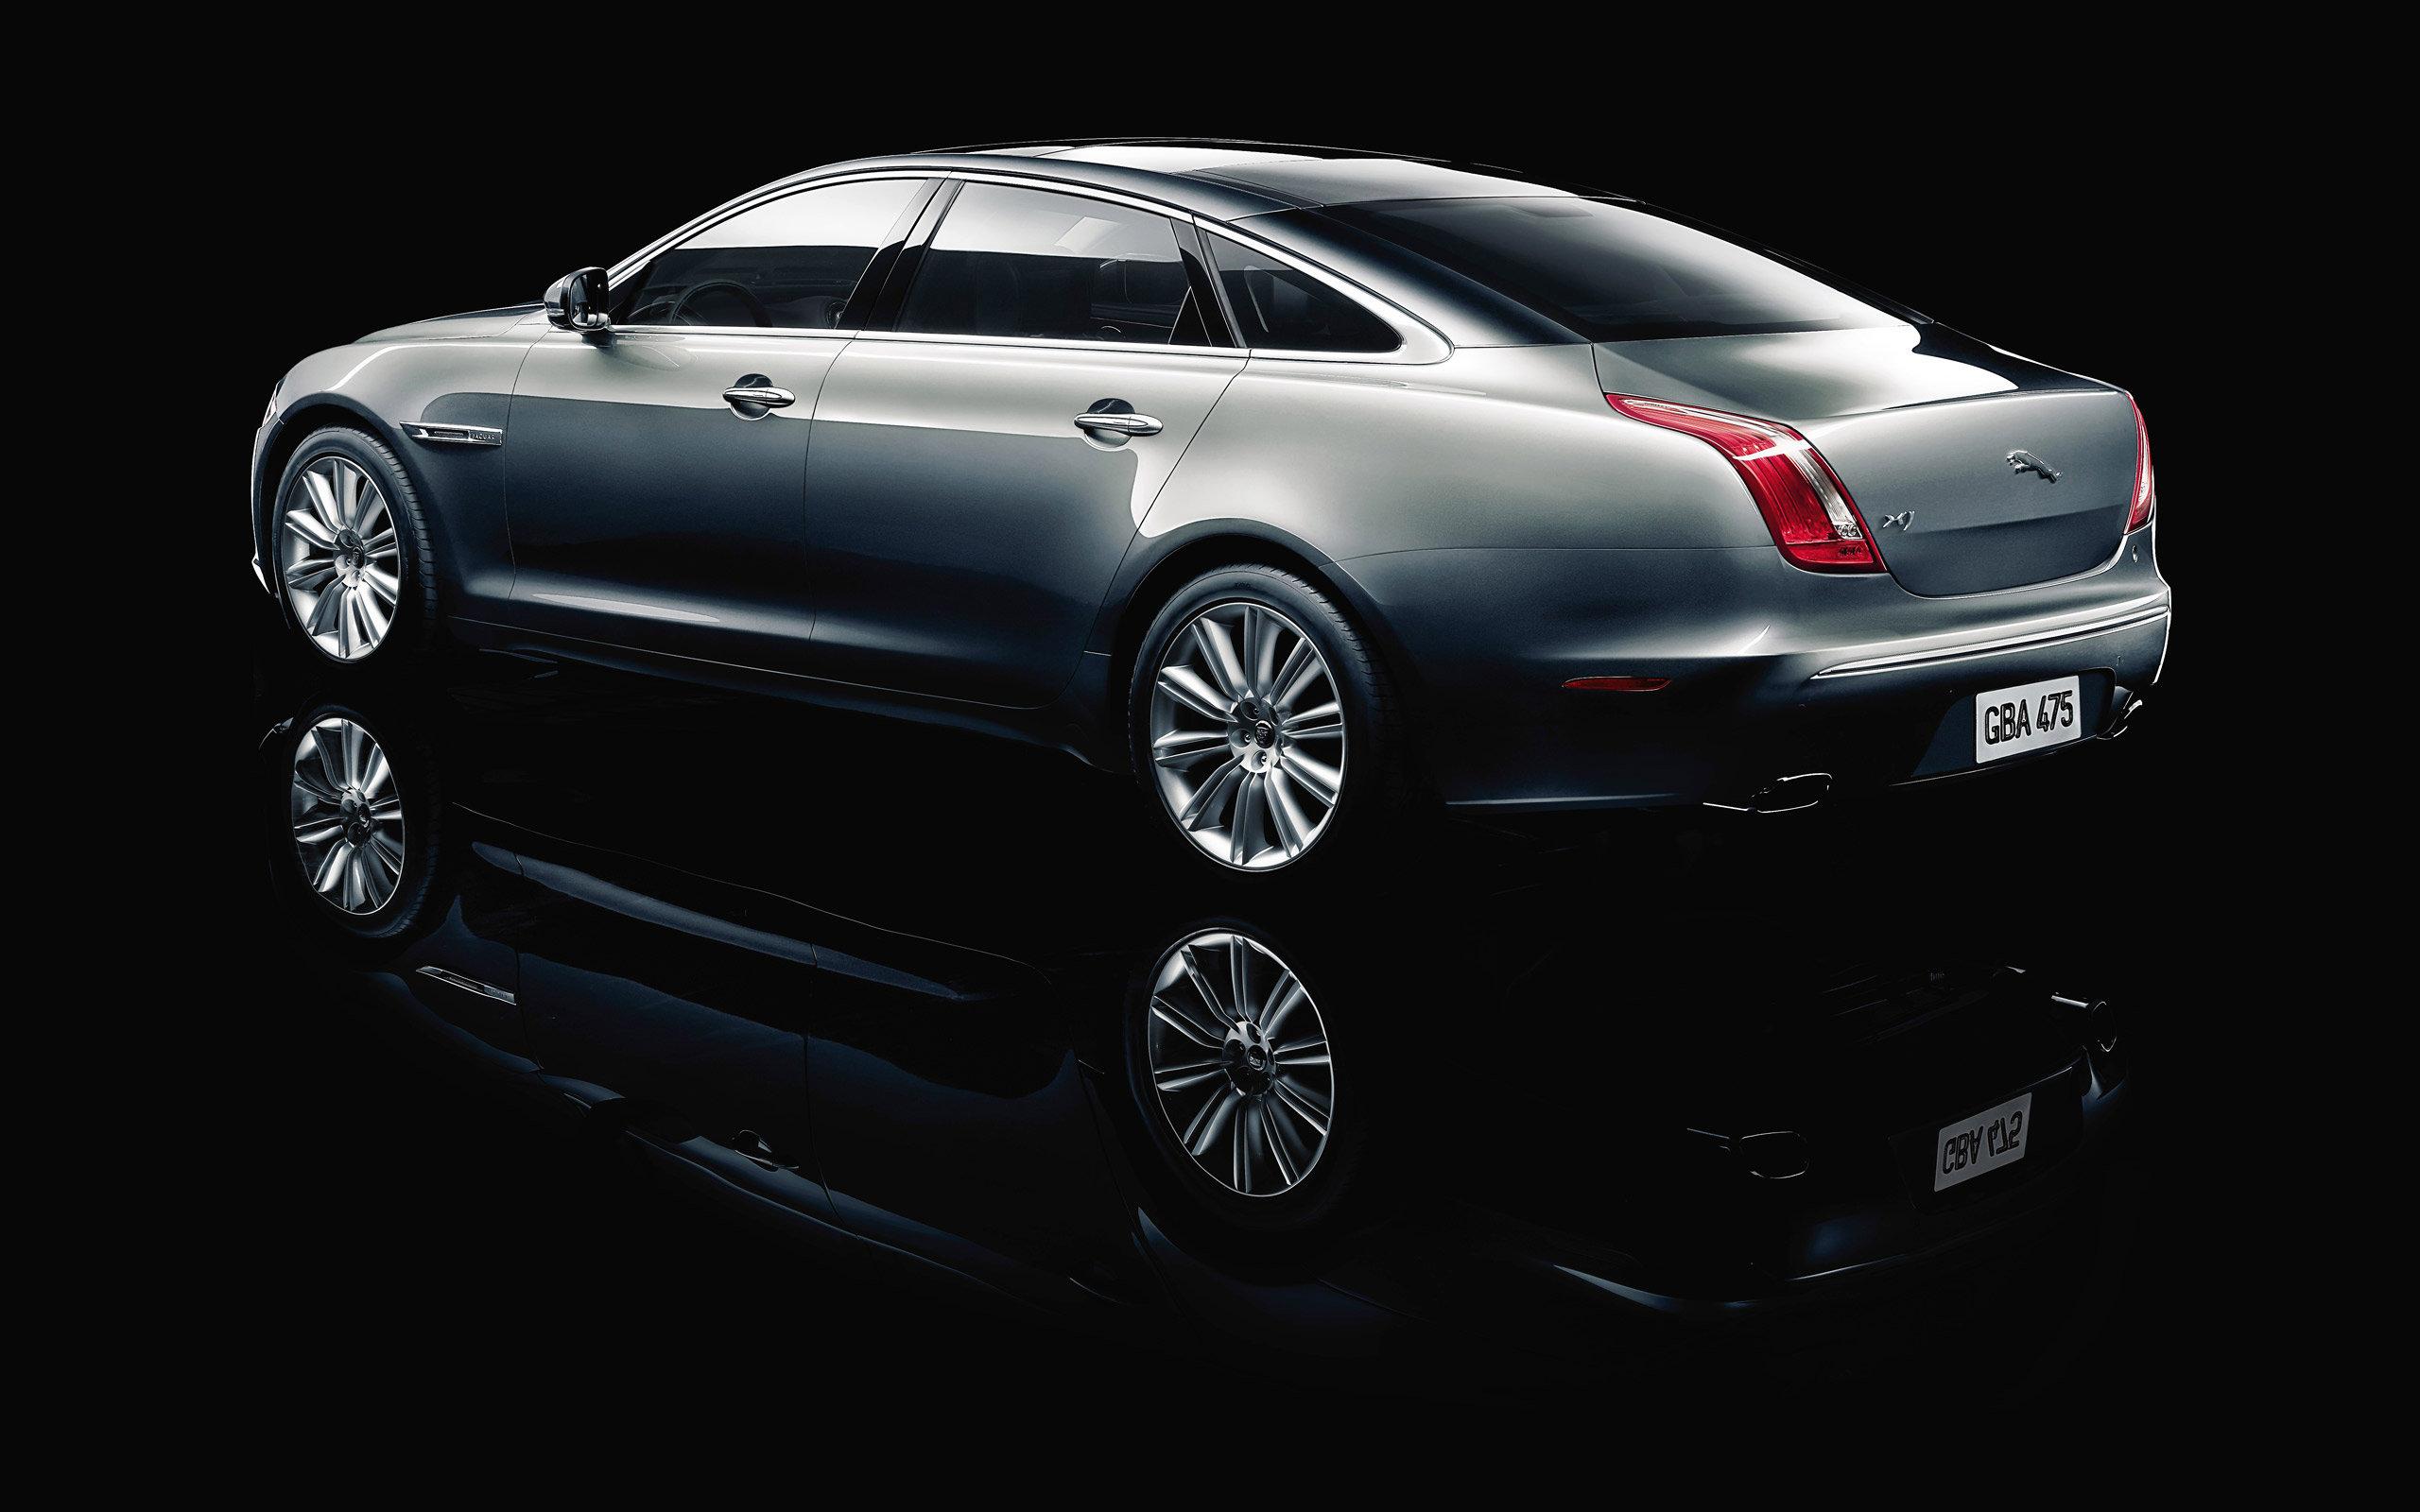 Free Jaguar Car High Quality Wallpaper Id 398139 For Hd 2560x1600